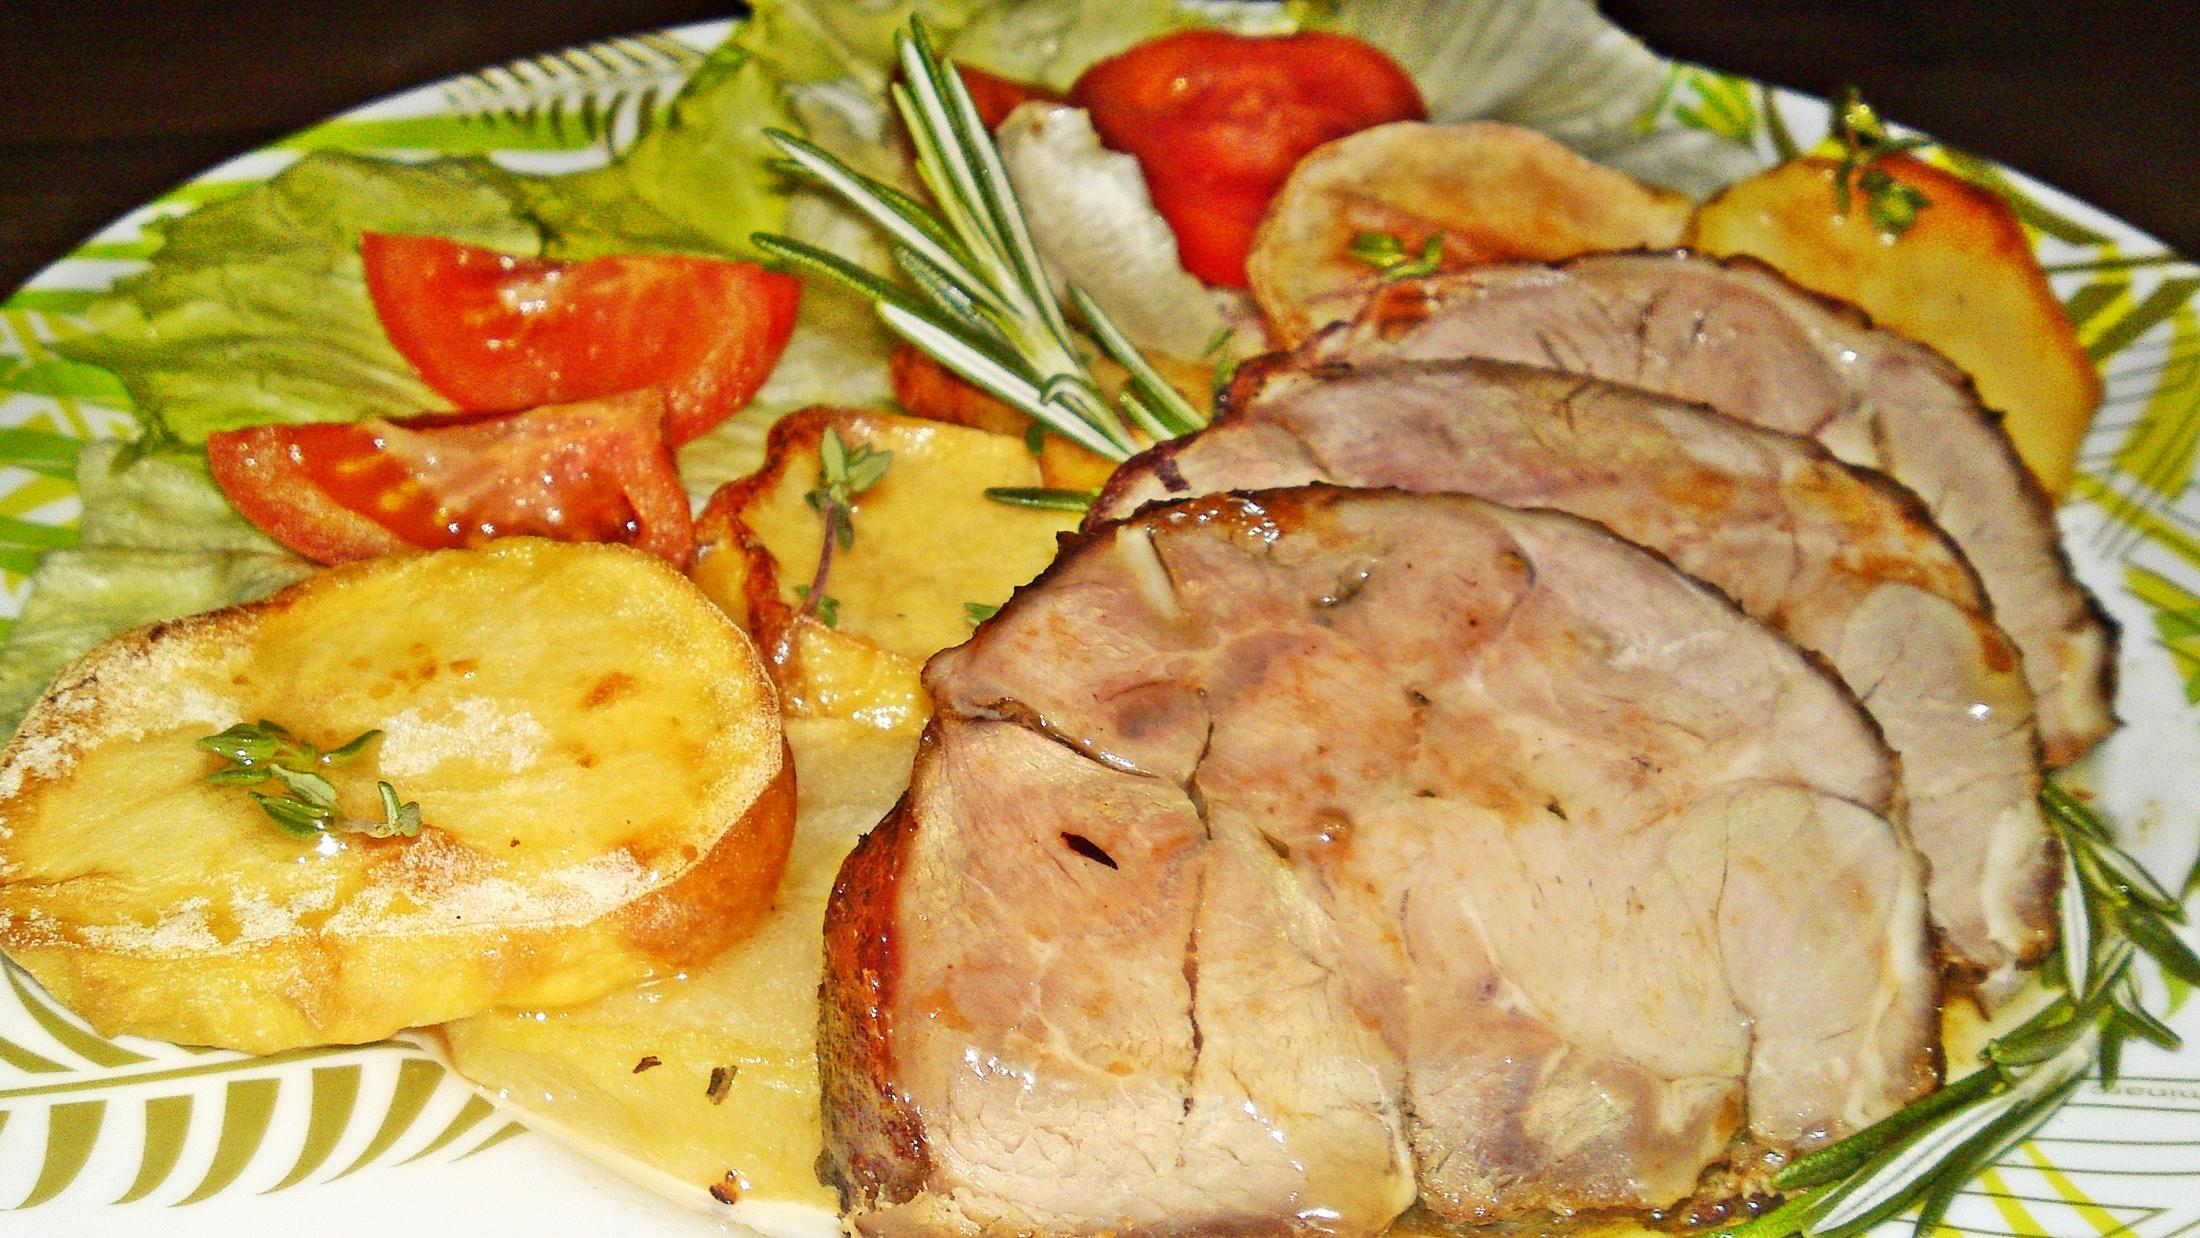 Recept Pečené jahňacie stehno na Chardonnay, citrusoch a bylinkách - Naservírované pečené jehněčí maso